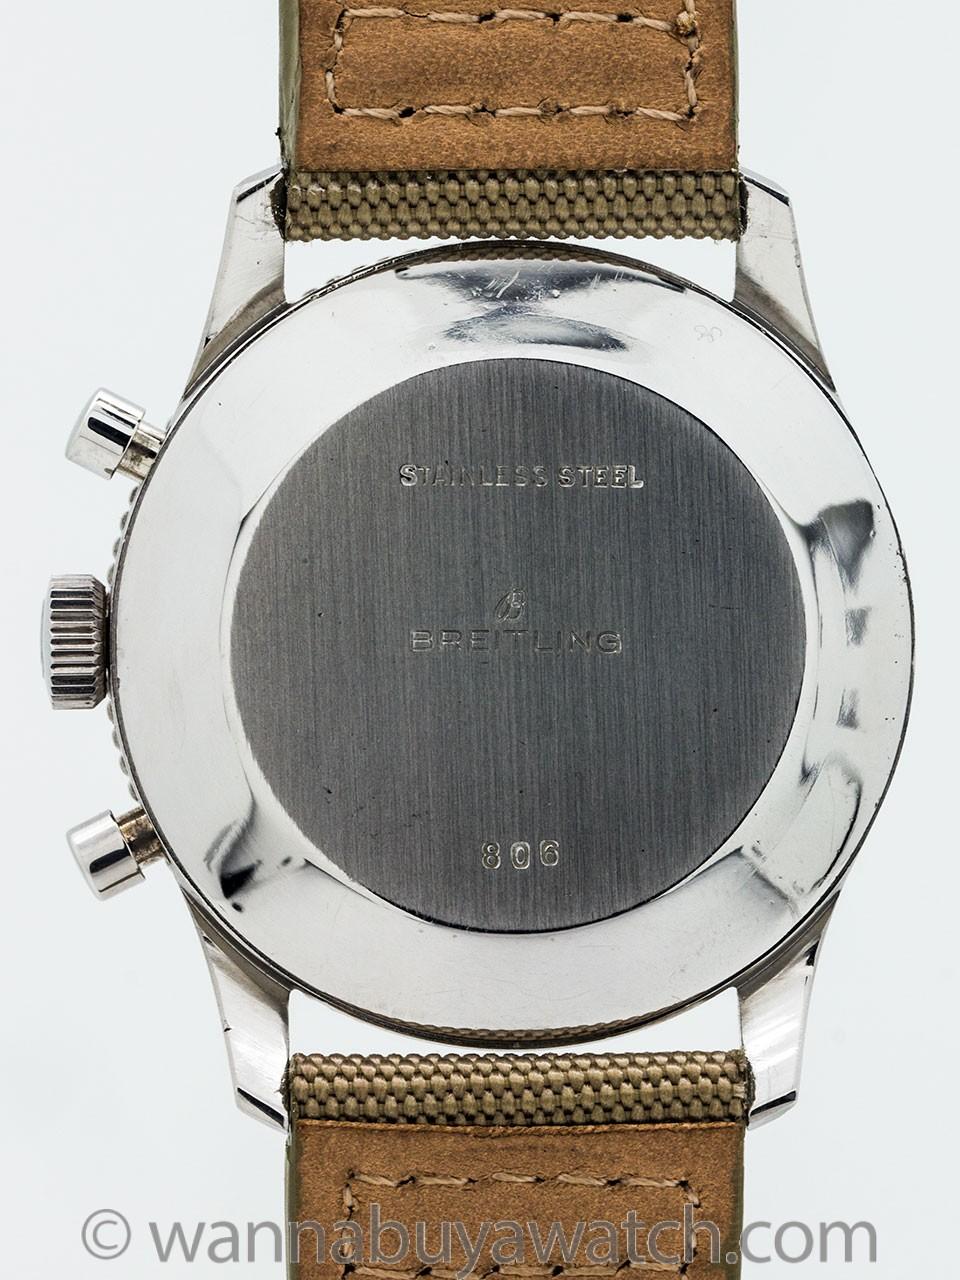 Vintage Breitling Navitimer ref 806 AOPA Transitional Beaded Bezel circa 1960